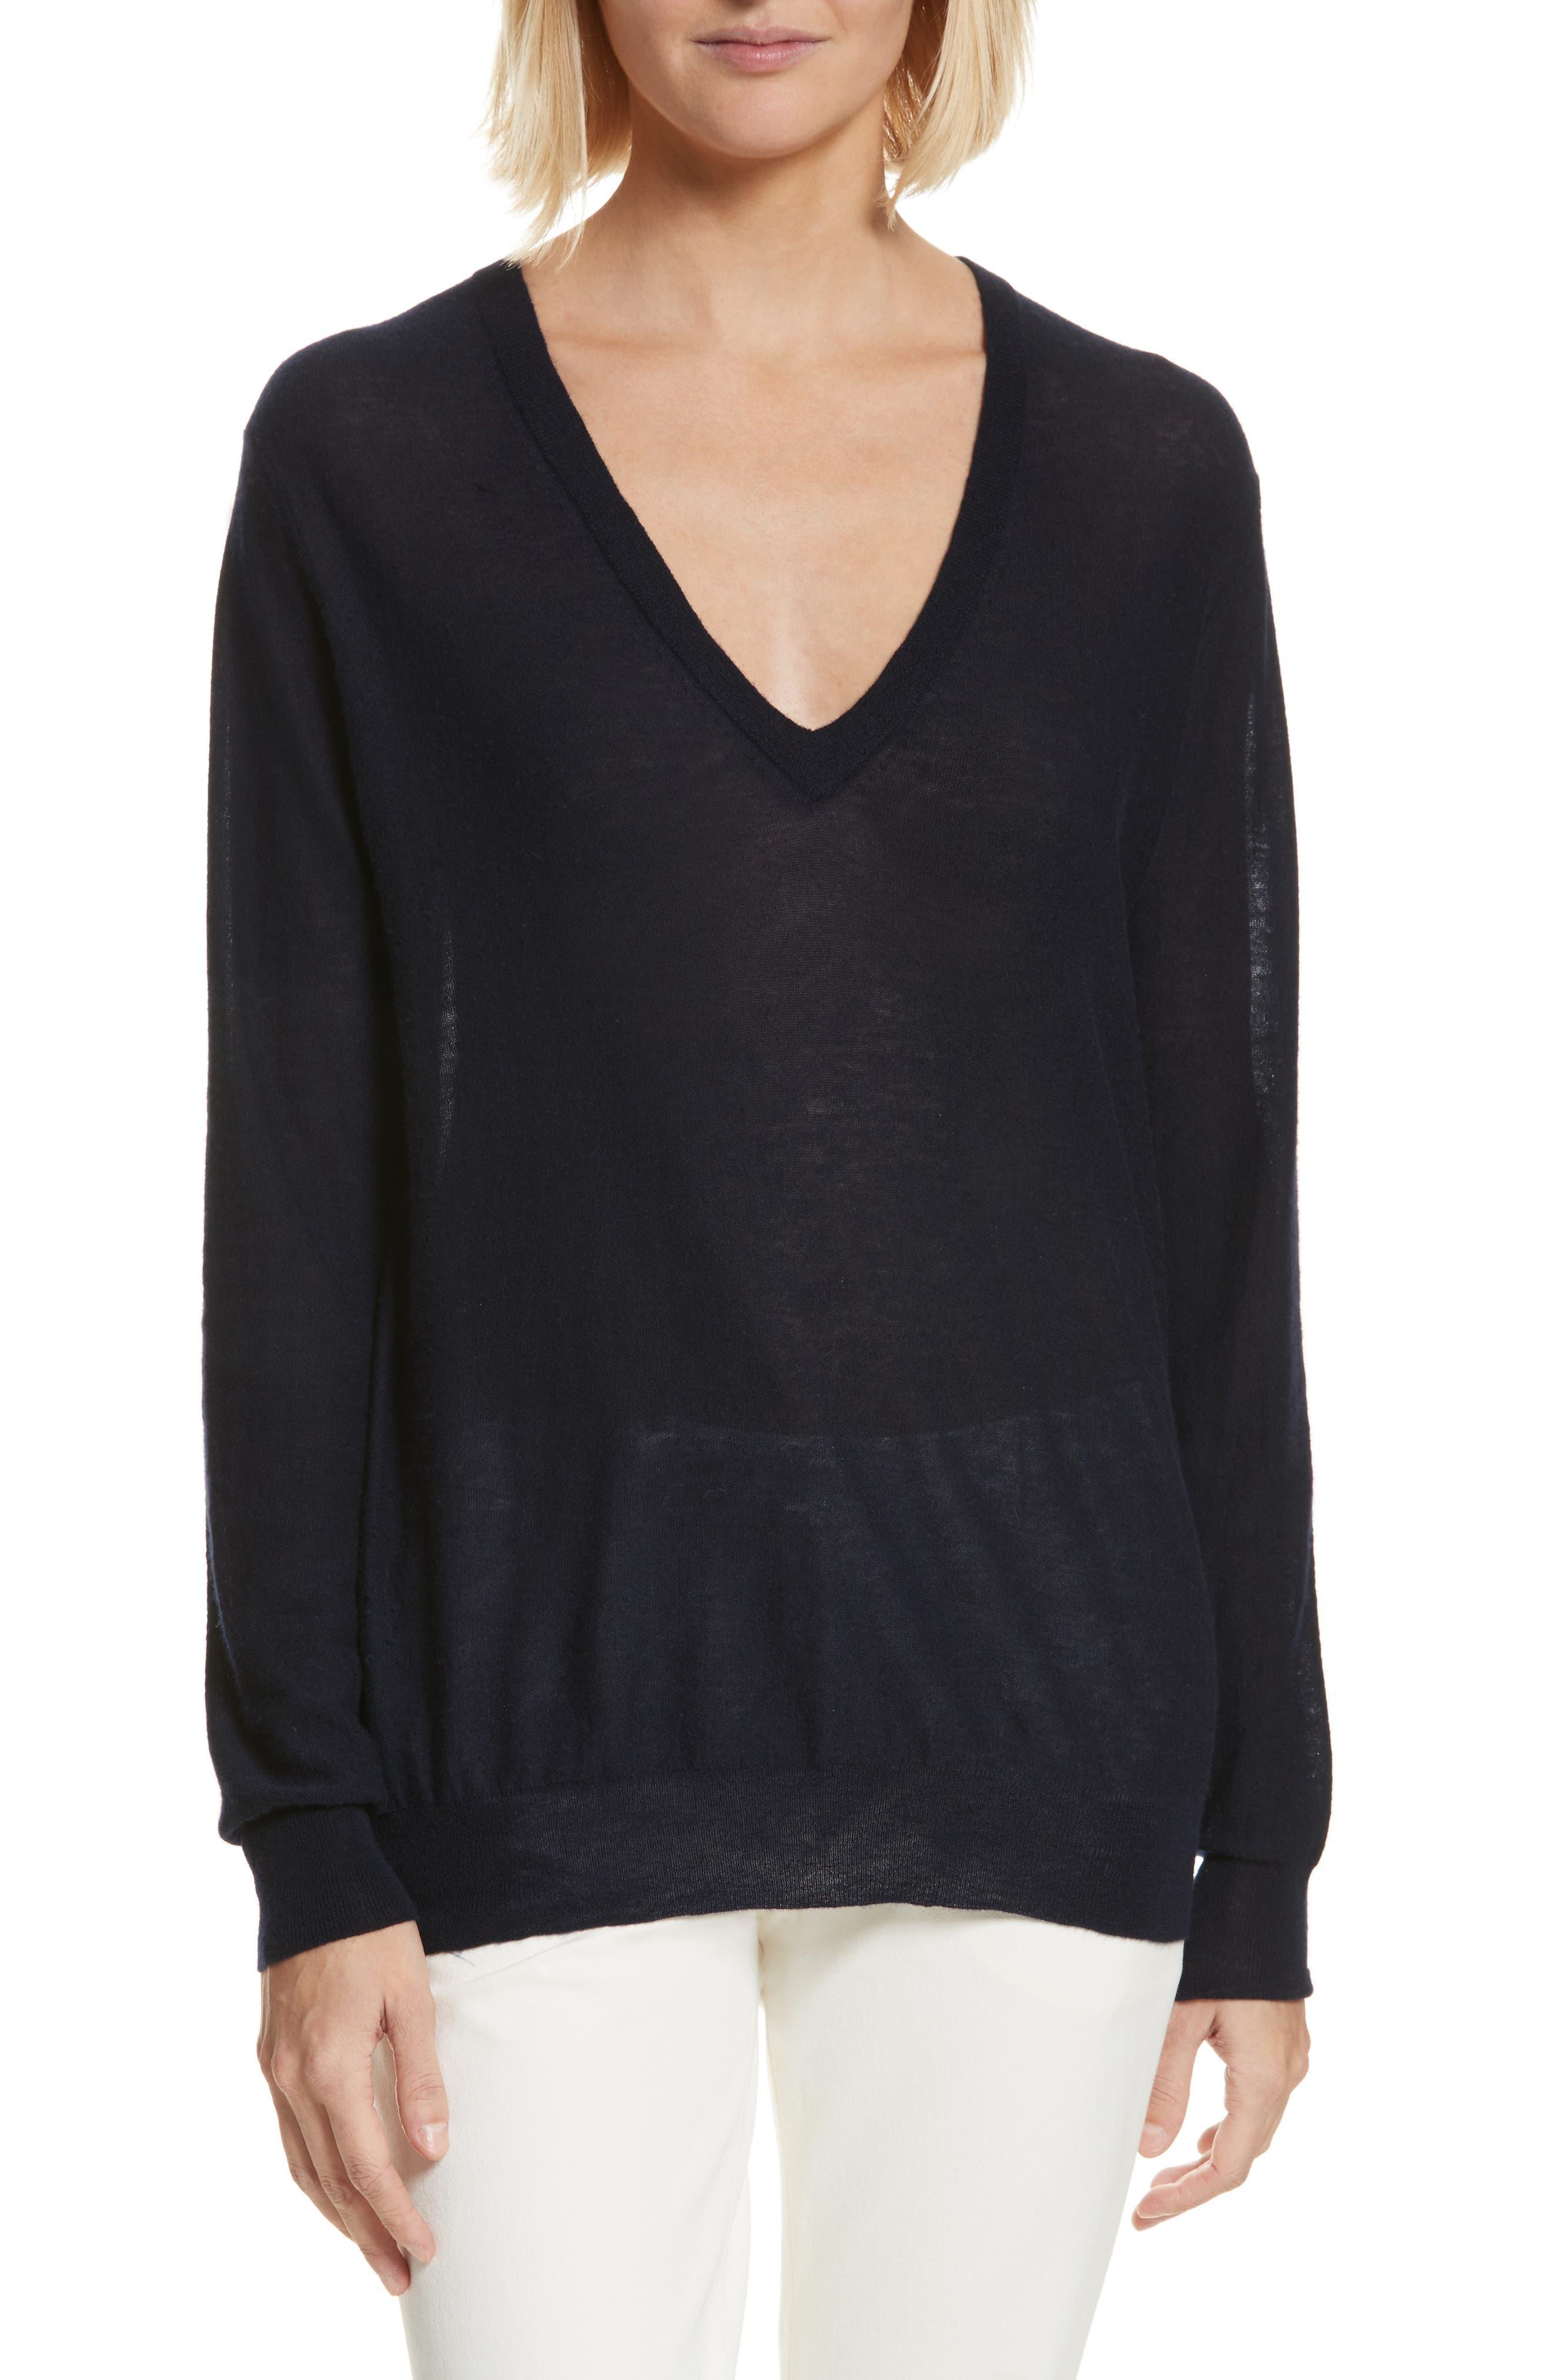 Main Image - JOSEPH V-Neck Cashair Cashmere Sweater